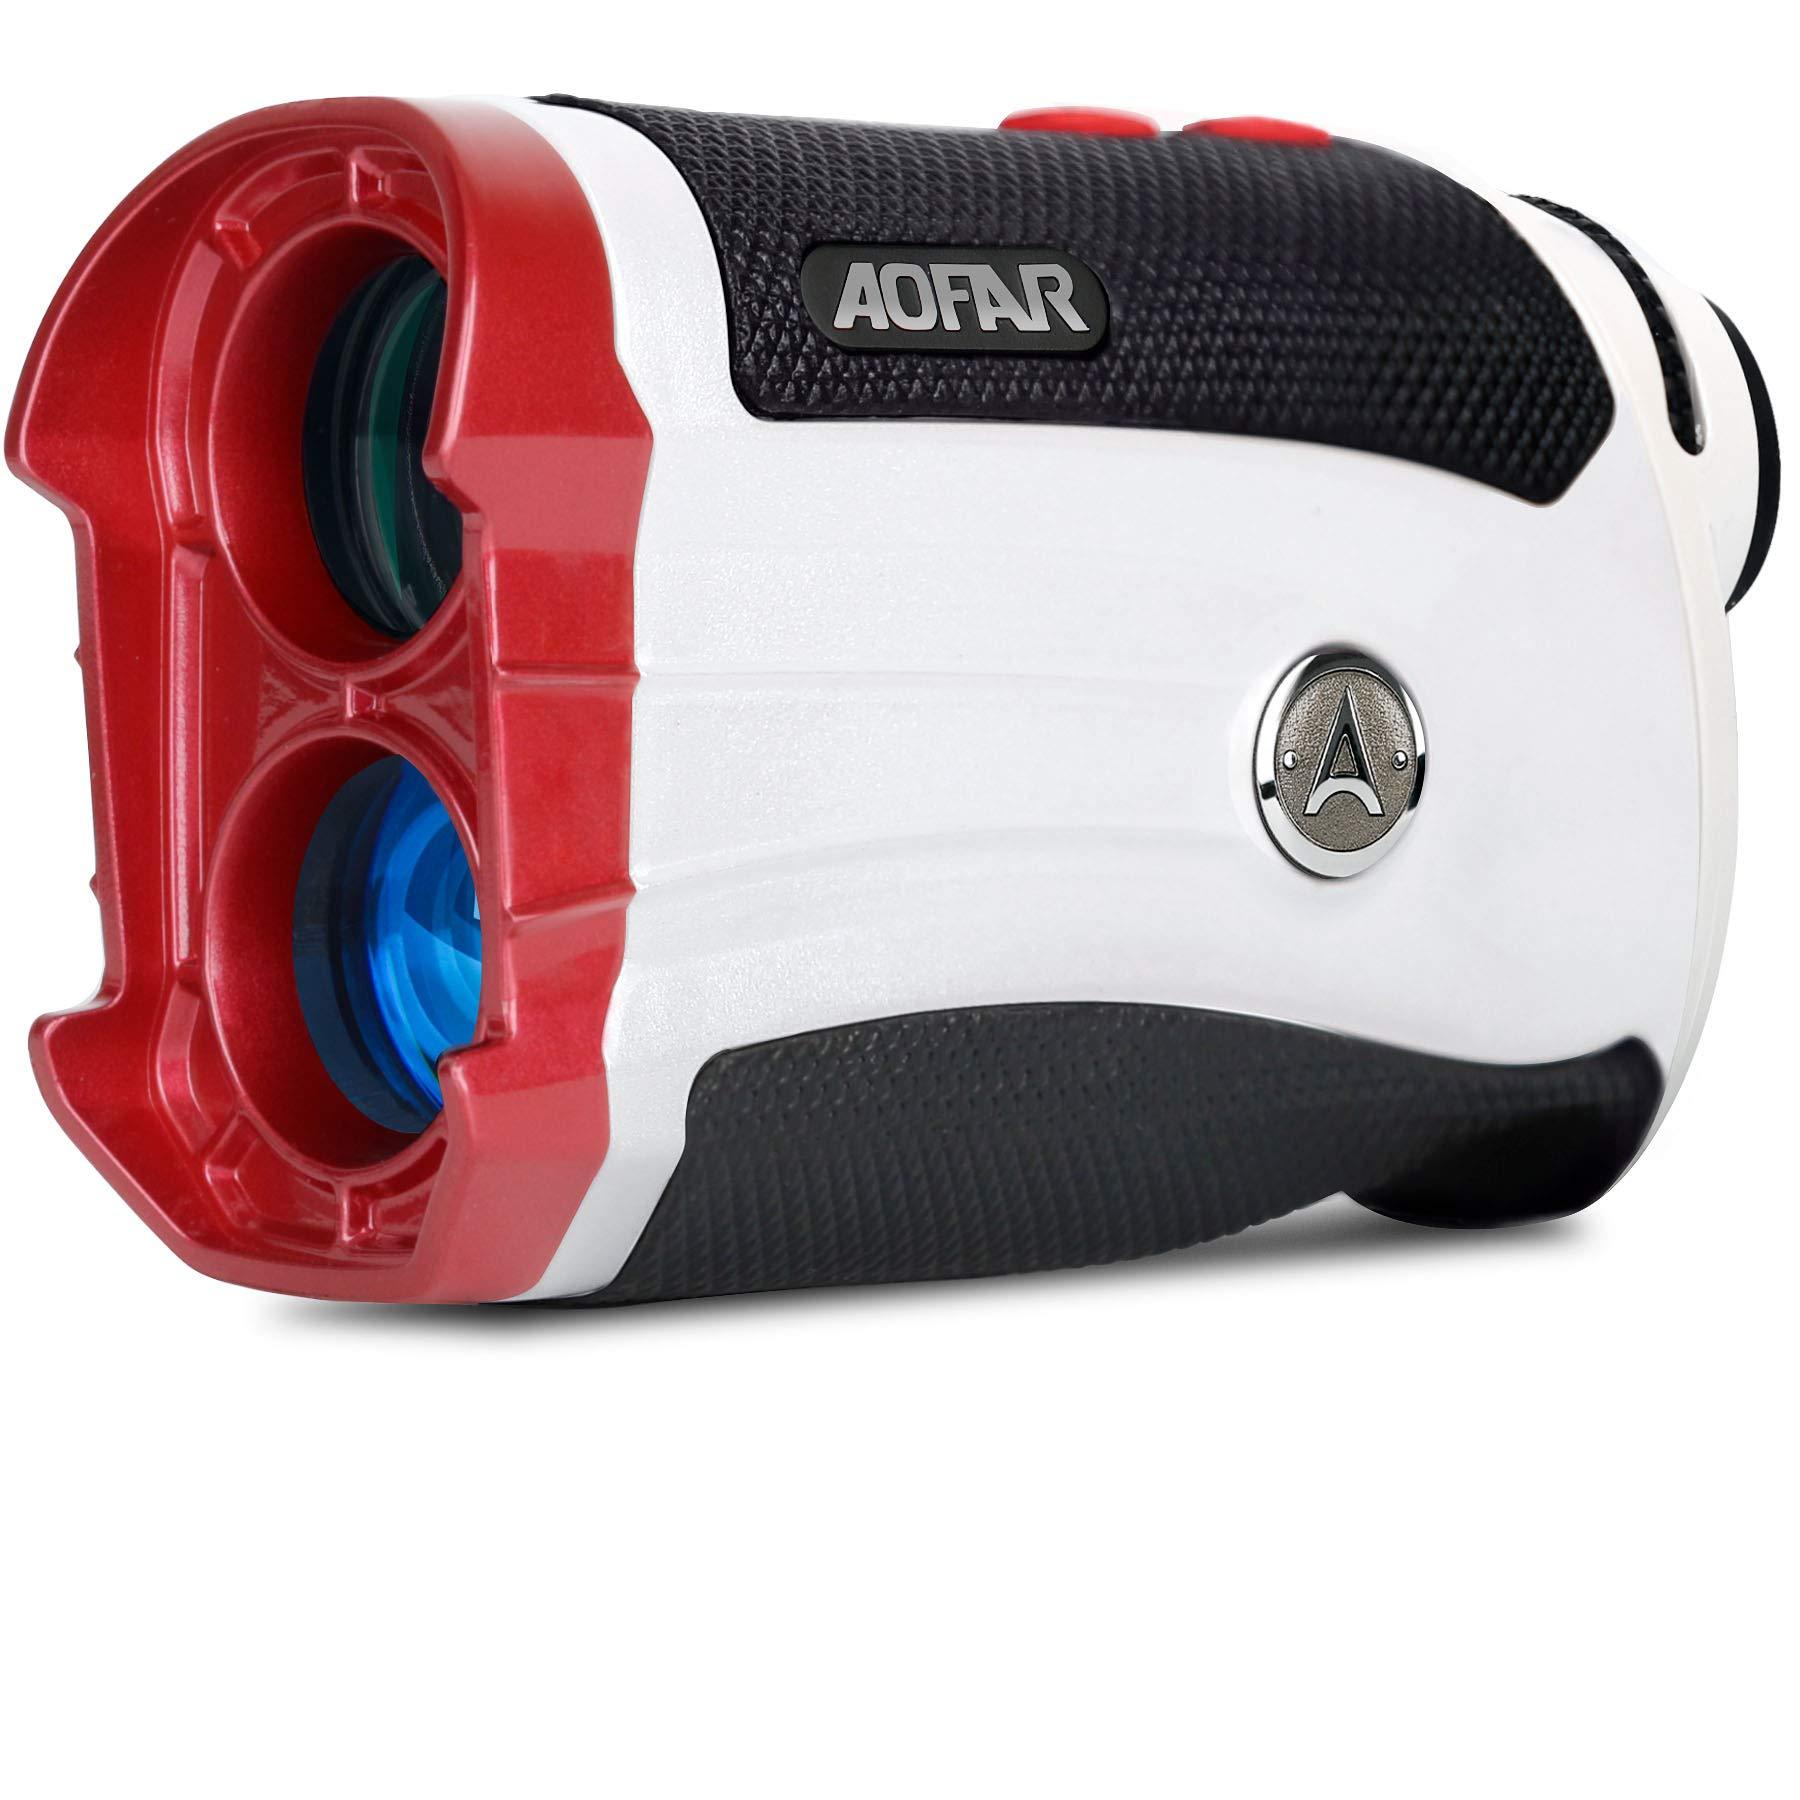 AOFAR G2 Slope Golf Rangefinder,600 Yards White Range Finder,Flagpole Lock, Vibration, 6X 25mm Waterproof, Carrying Case, Battery, Gift Packaging